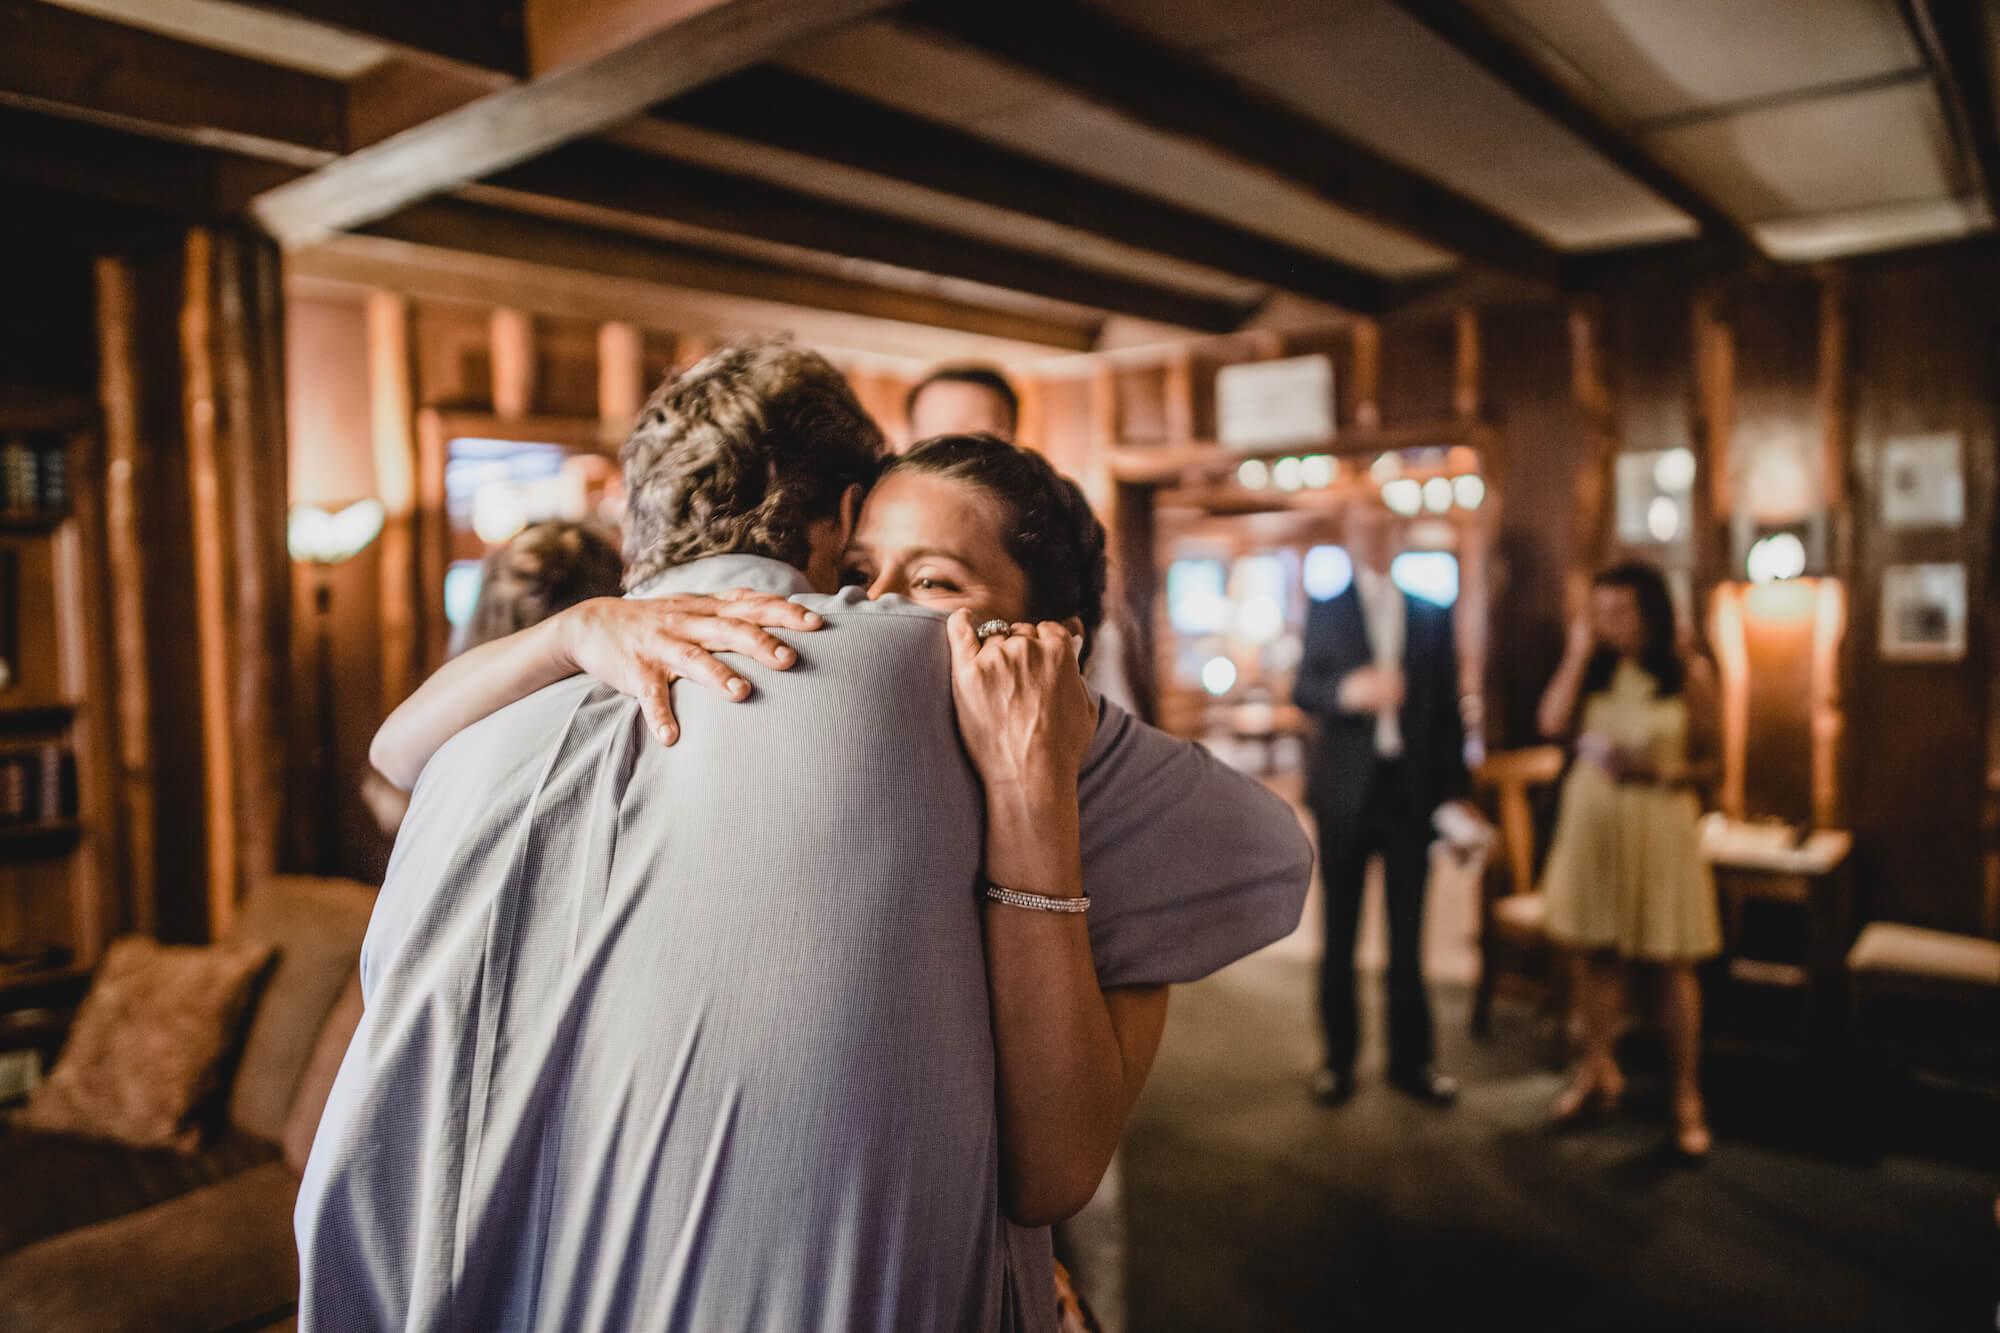 engle-olson-maddy-pat-mn-wedding-photography-27.jpg